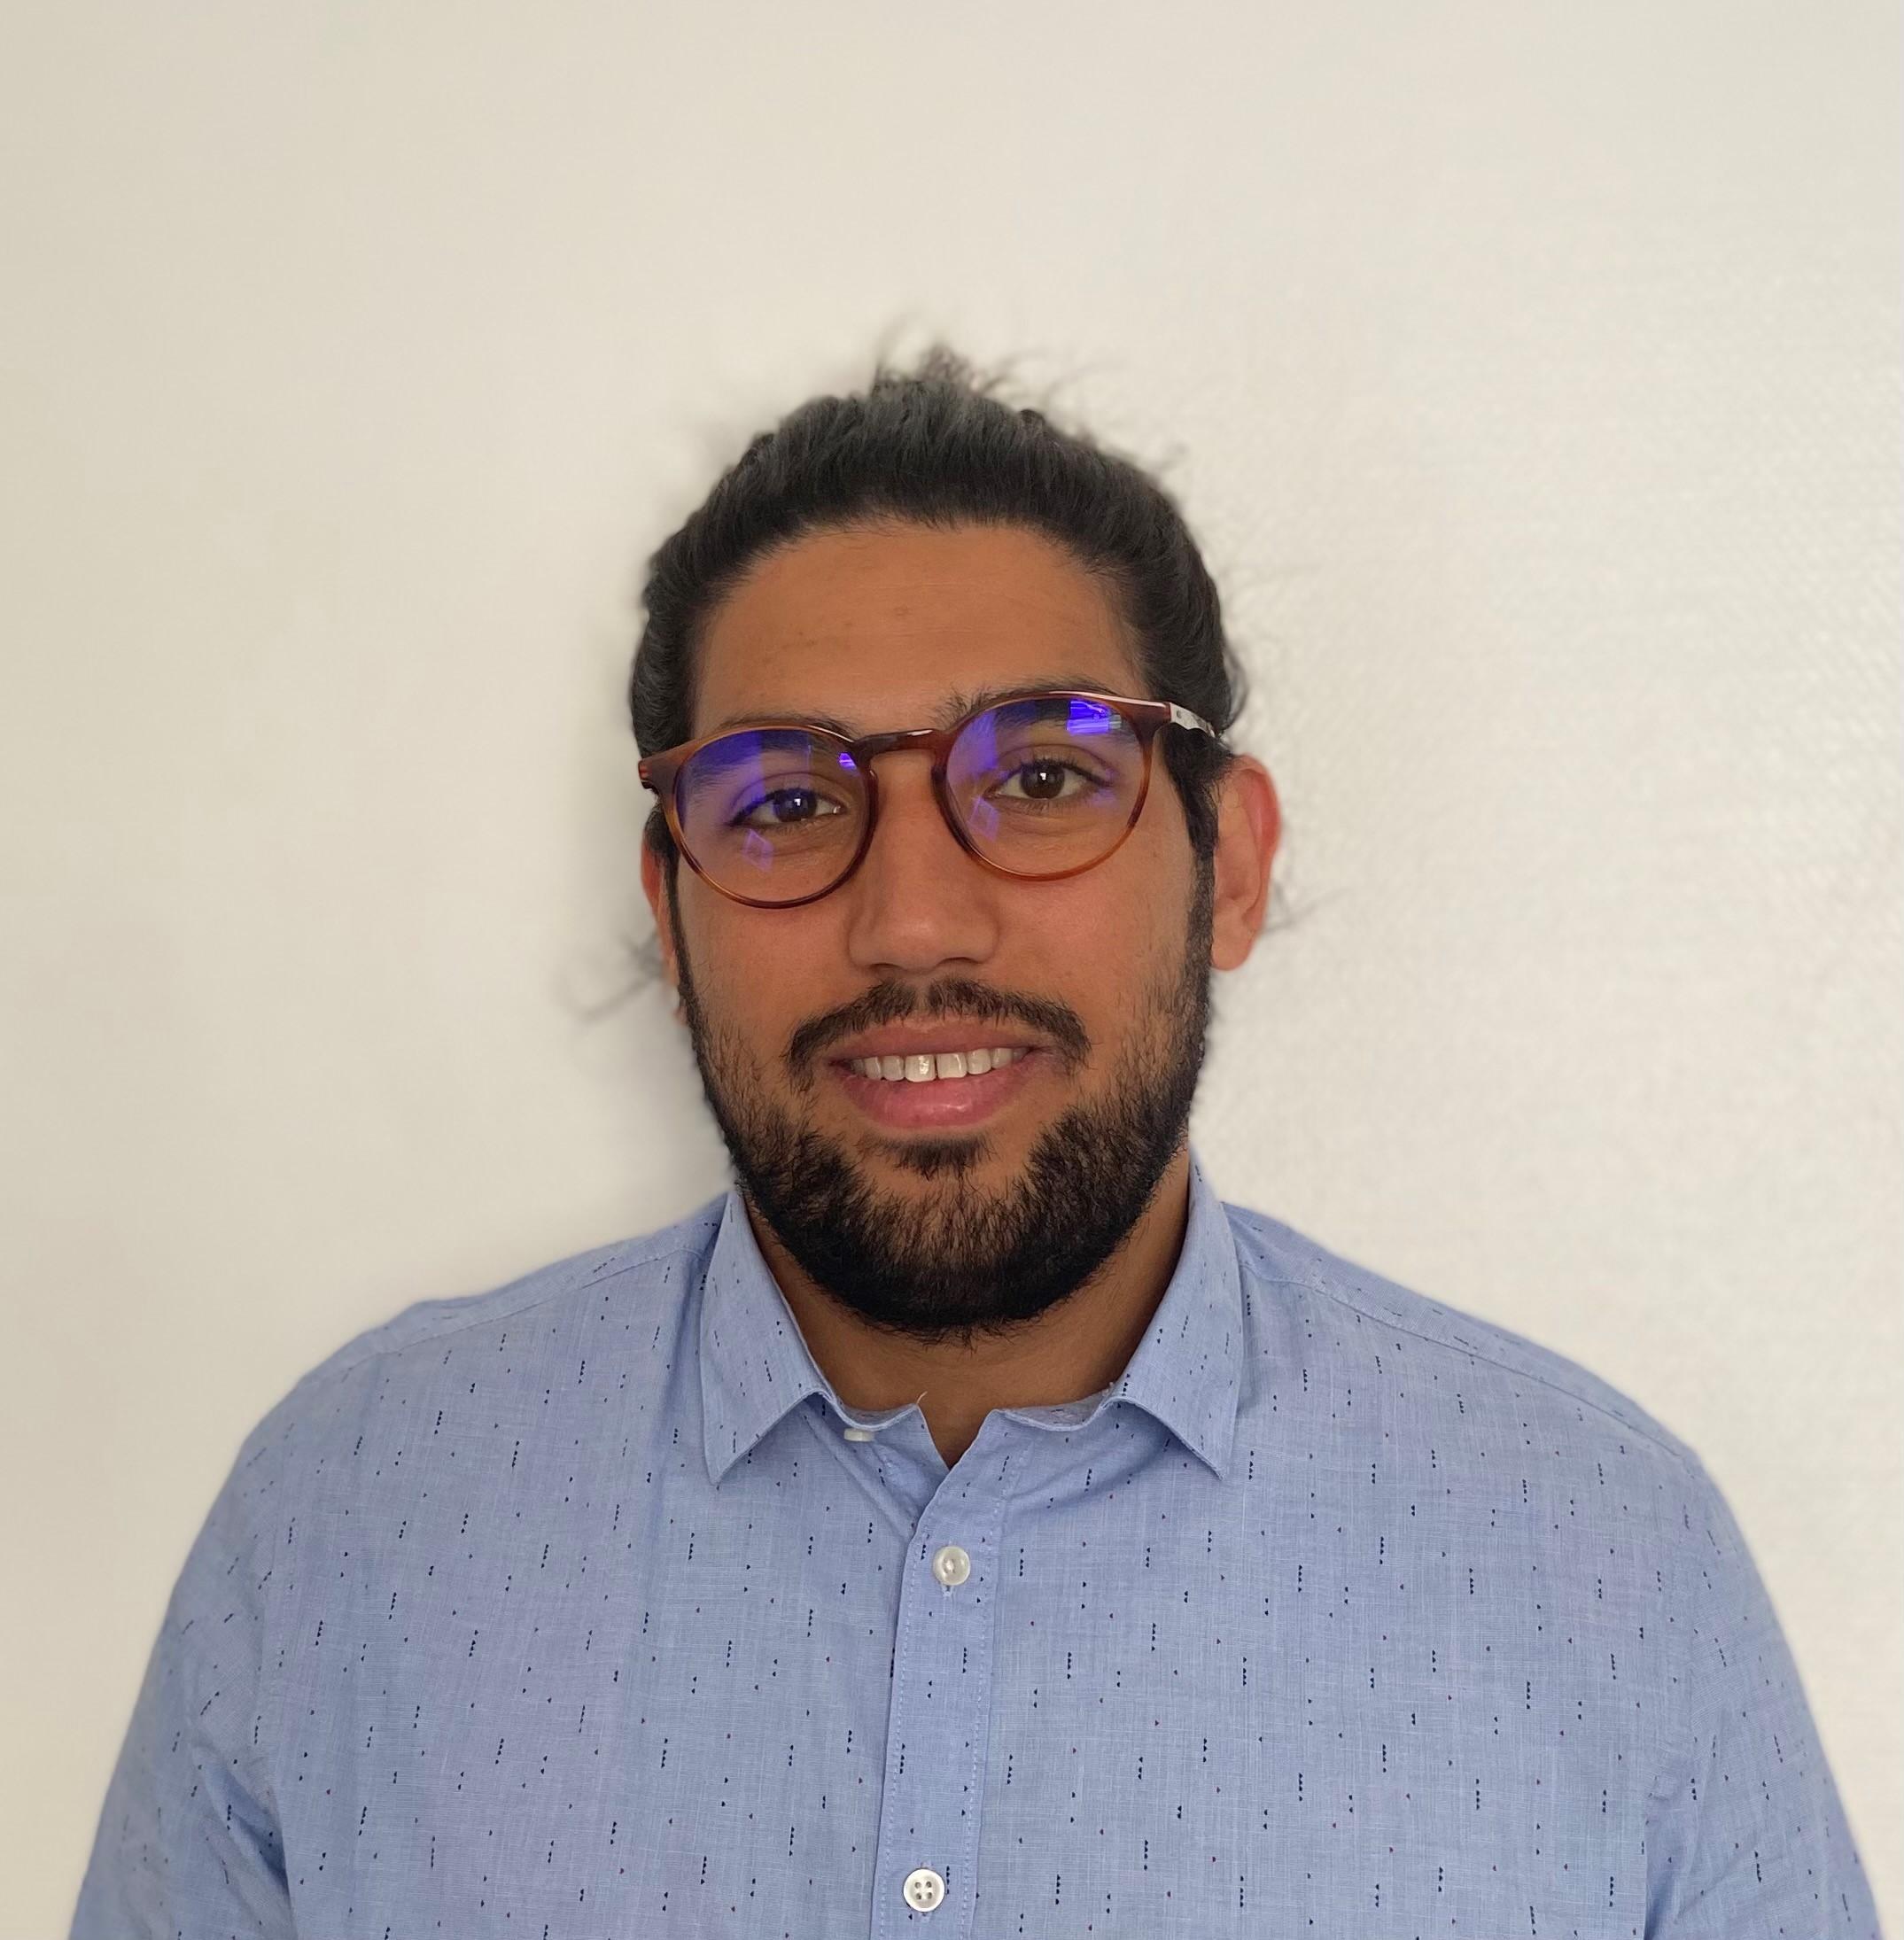 Achraf Rabbani